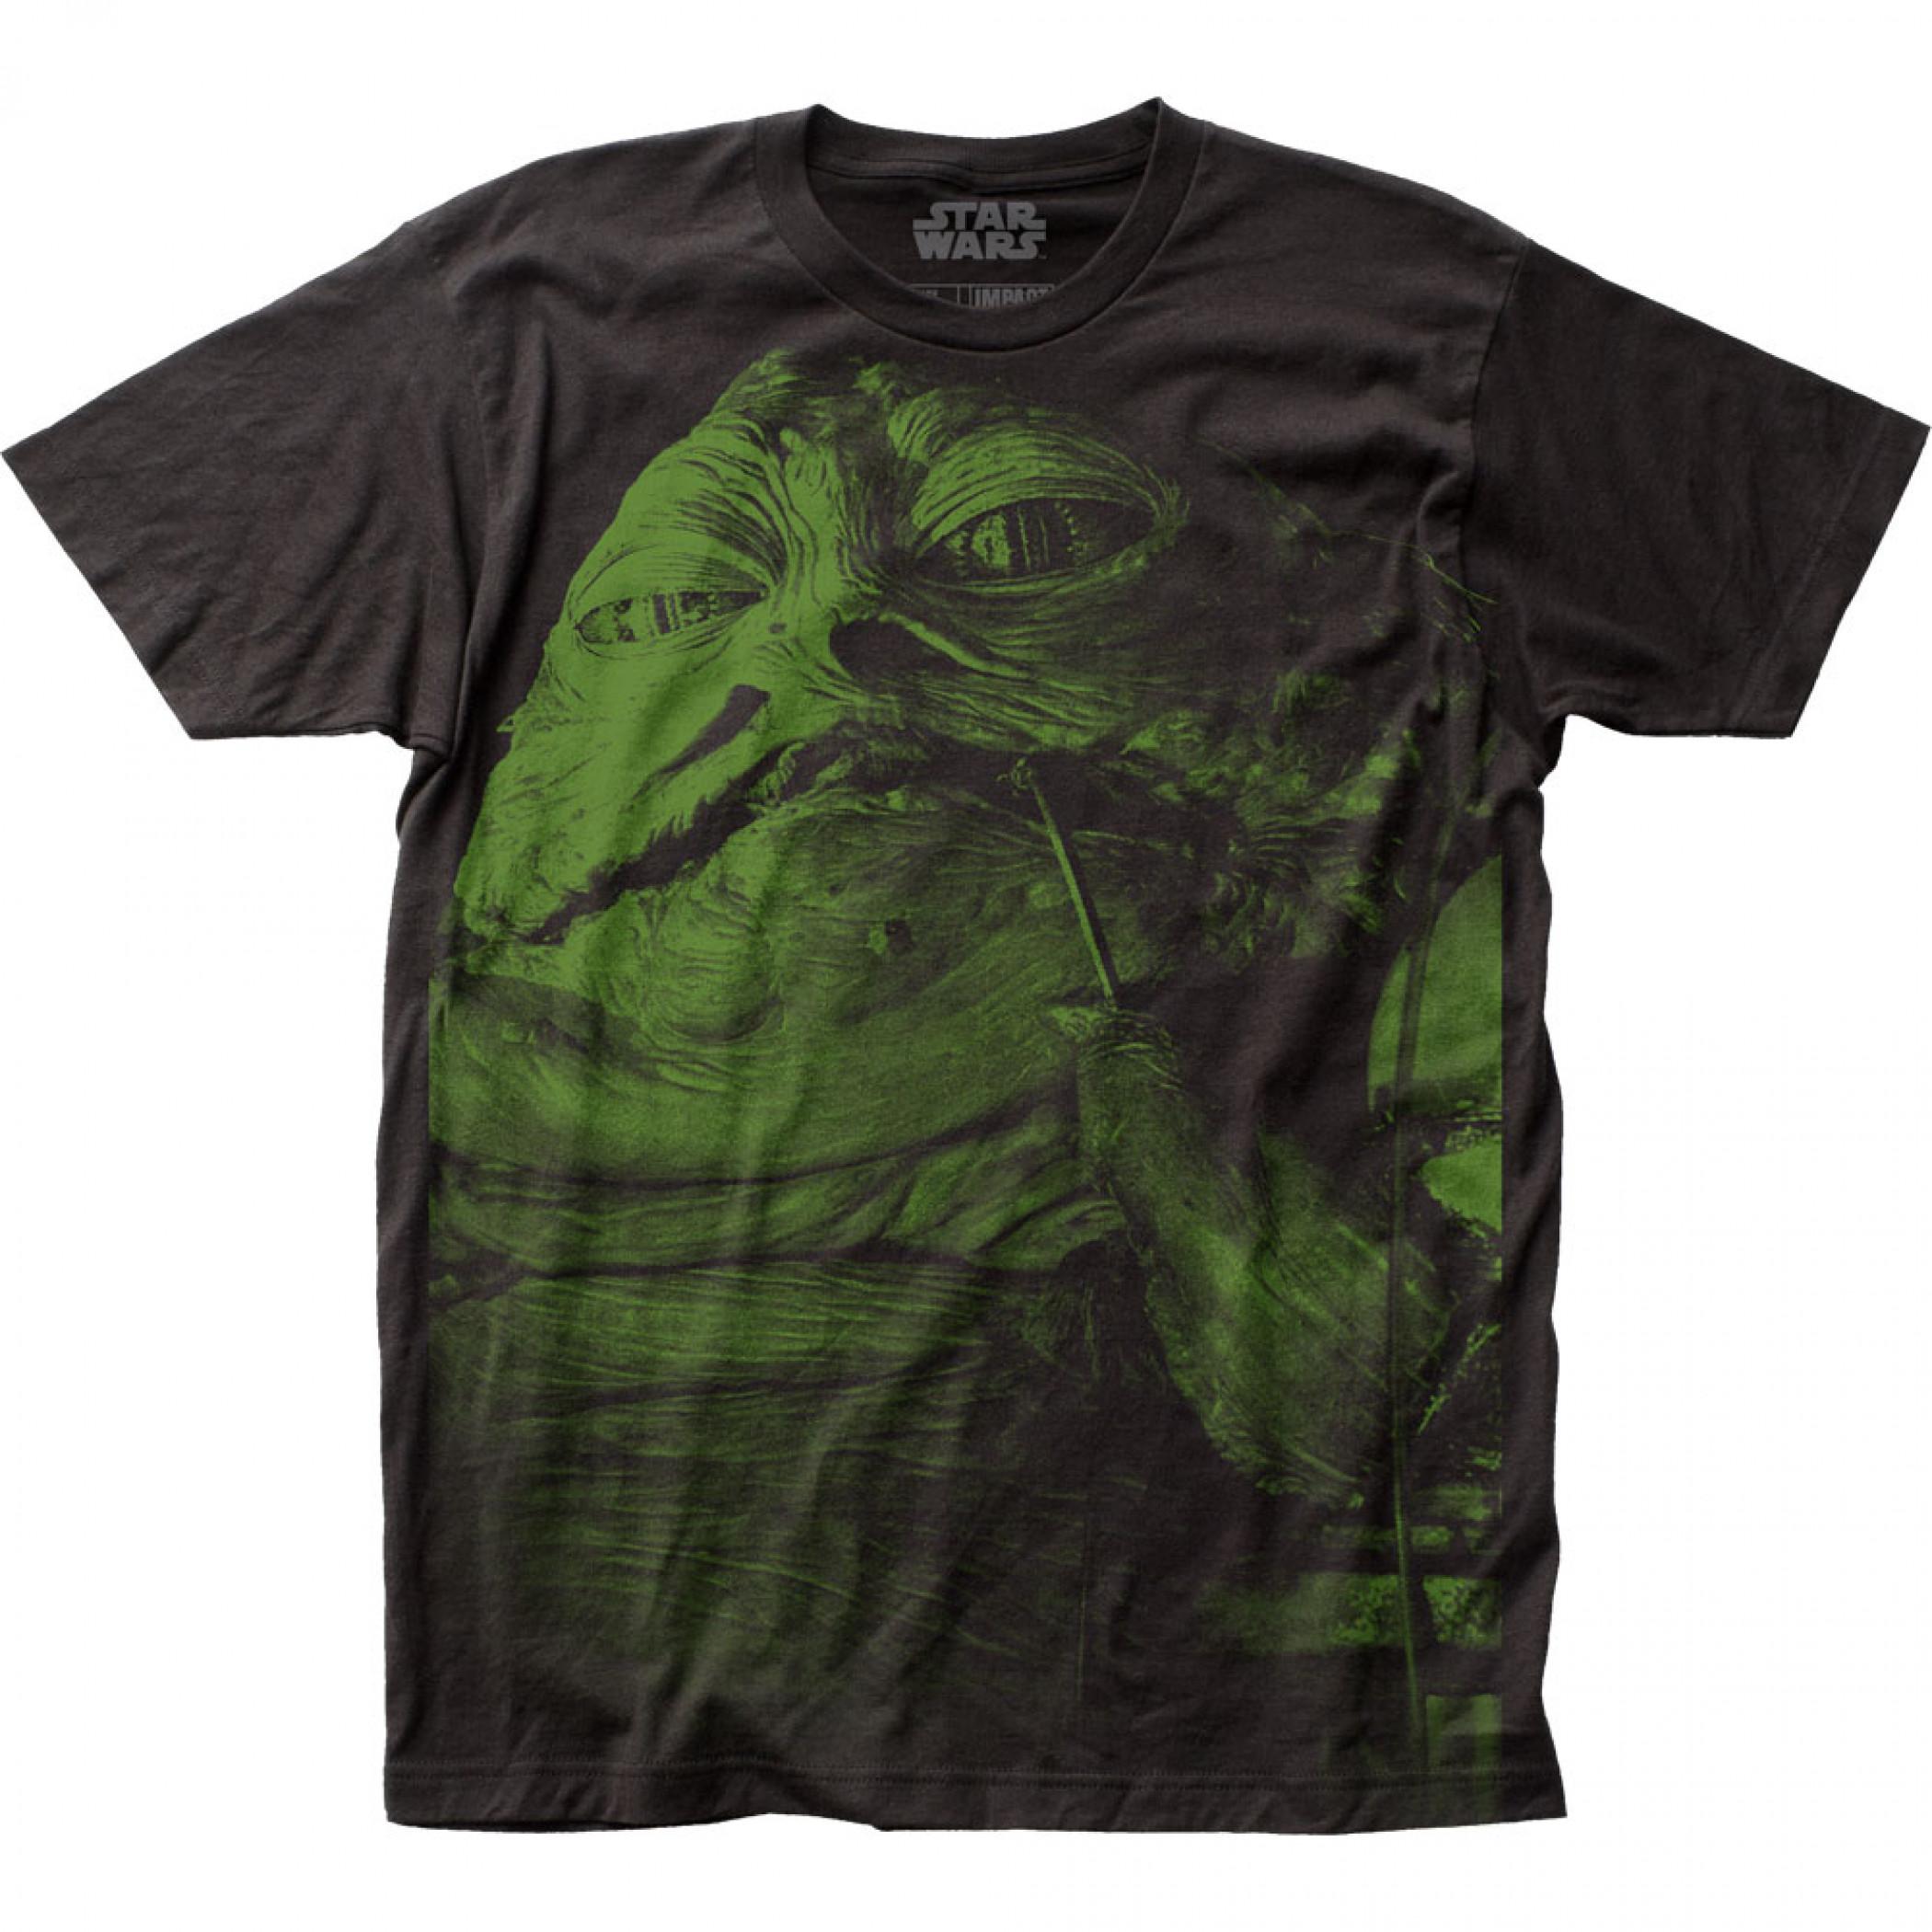 Star Wars Jabba the Hutt Large Subway Print T-Shirt